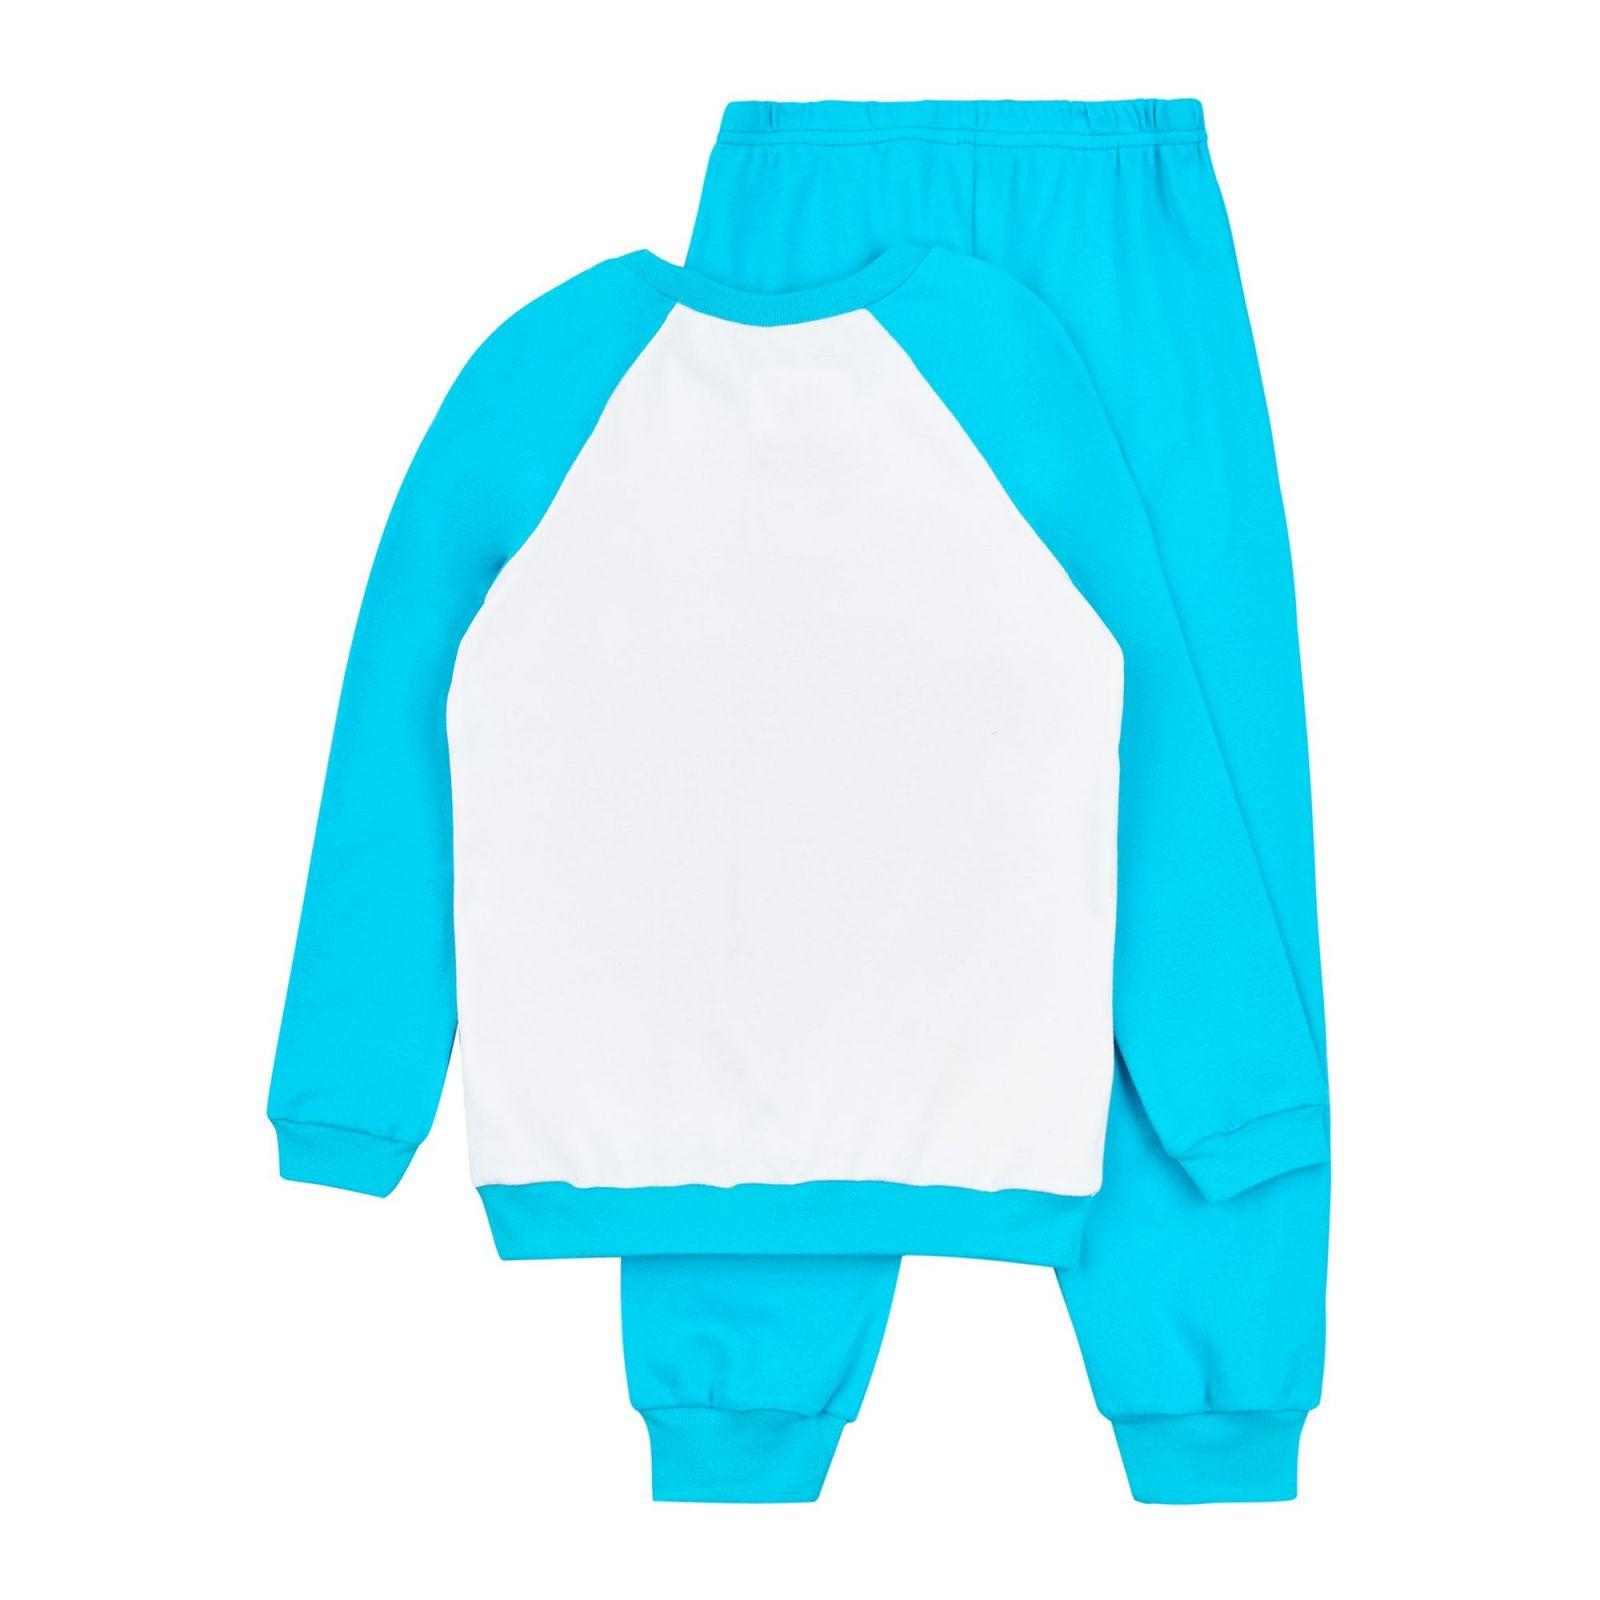 Пижама детские Garnamama модель 2EI~50841-14 цена, 2017